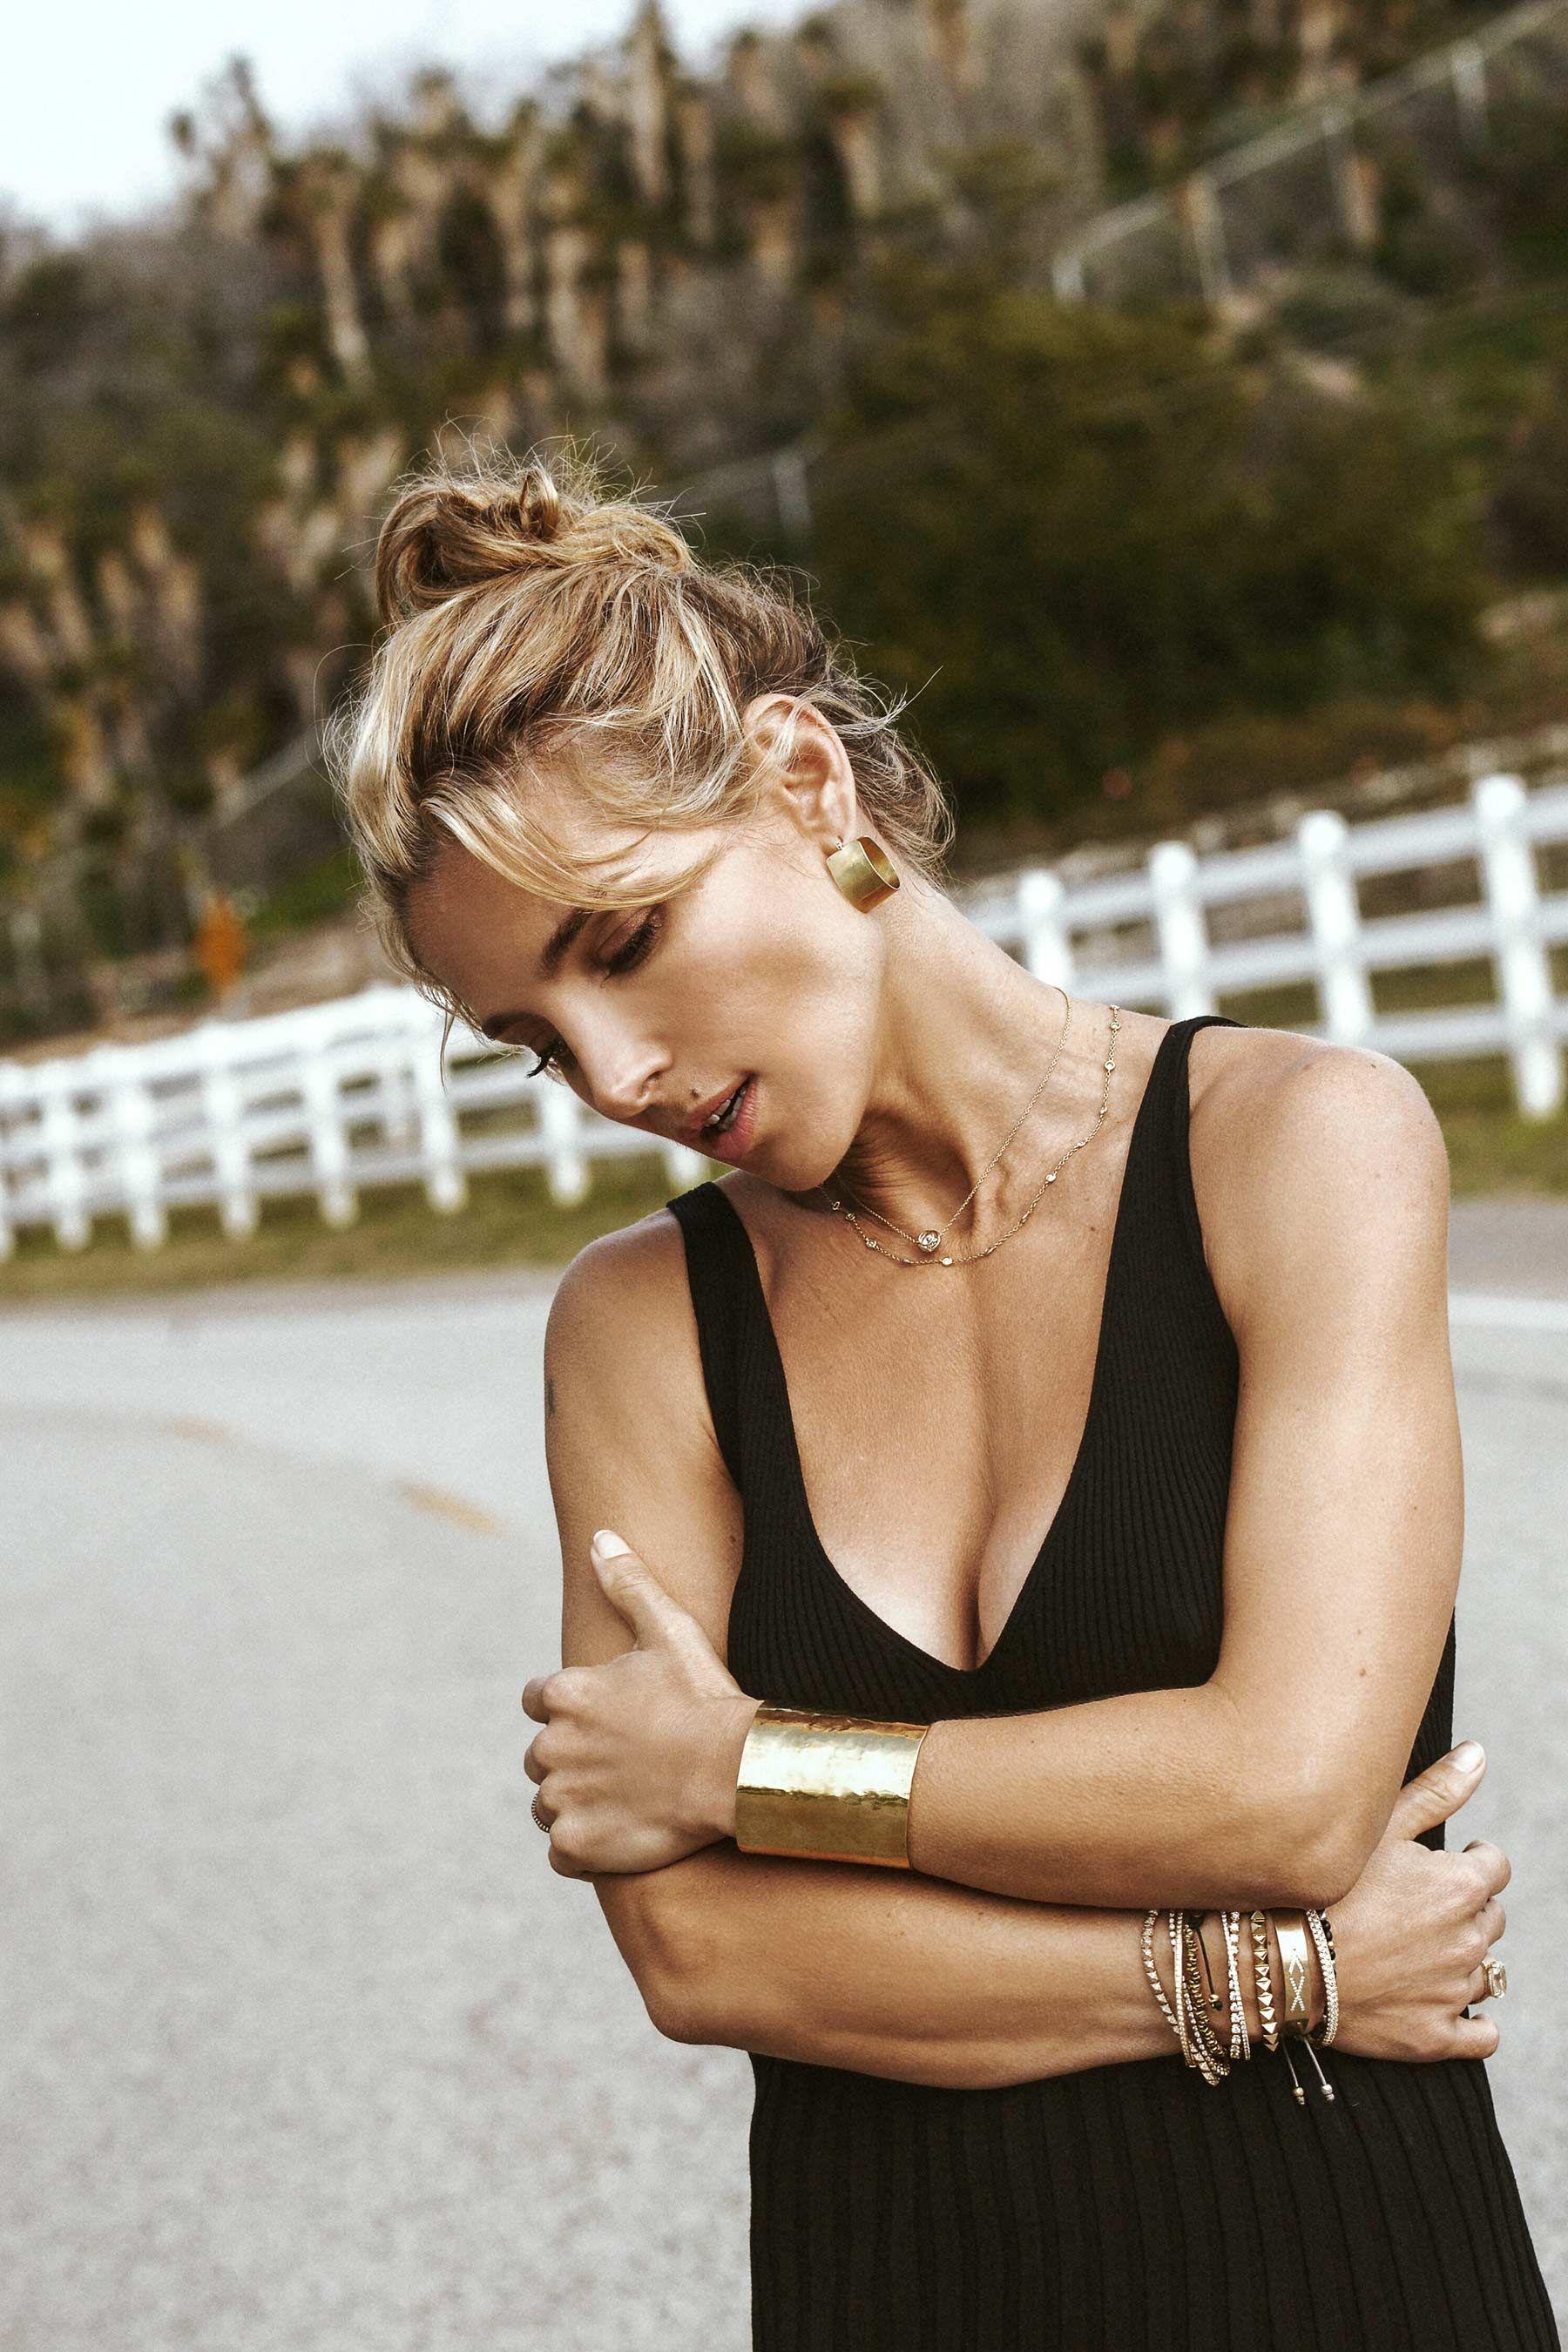 Snapchat Elsa Pataky nudes (73 foto and video), Sexy, Bikini, Feet, braless 2006